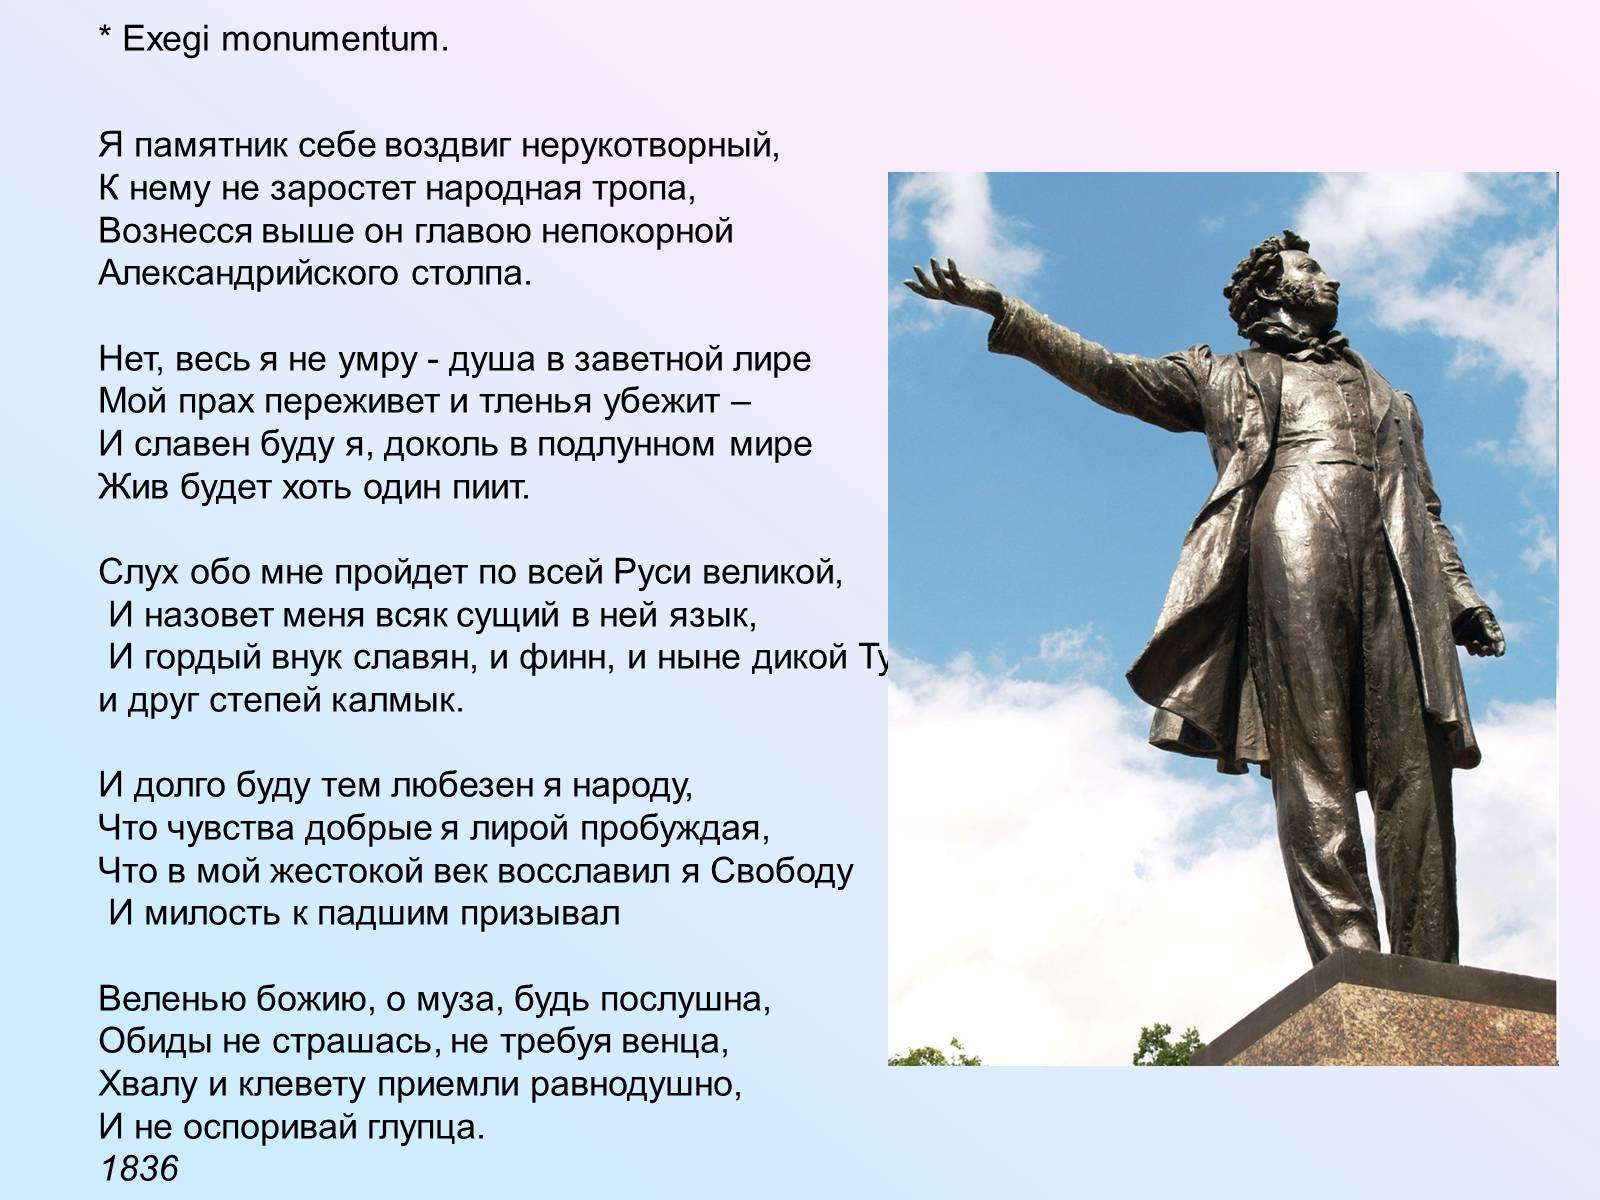 Стих а с пушкина я памятник воздвигнул